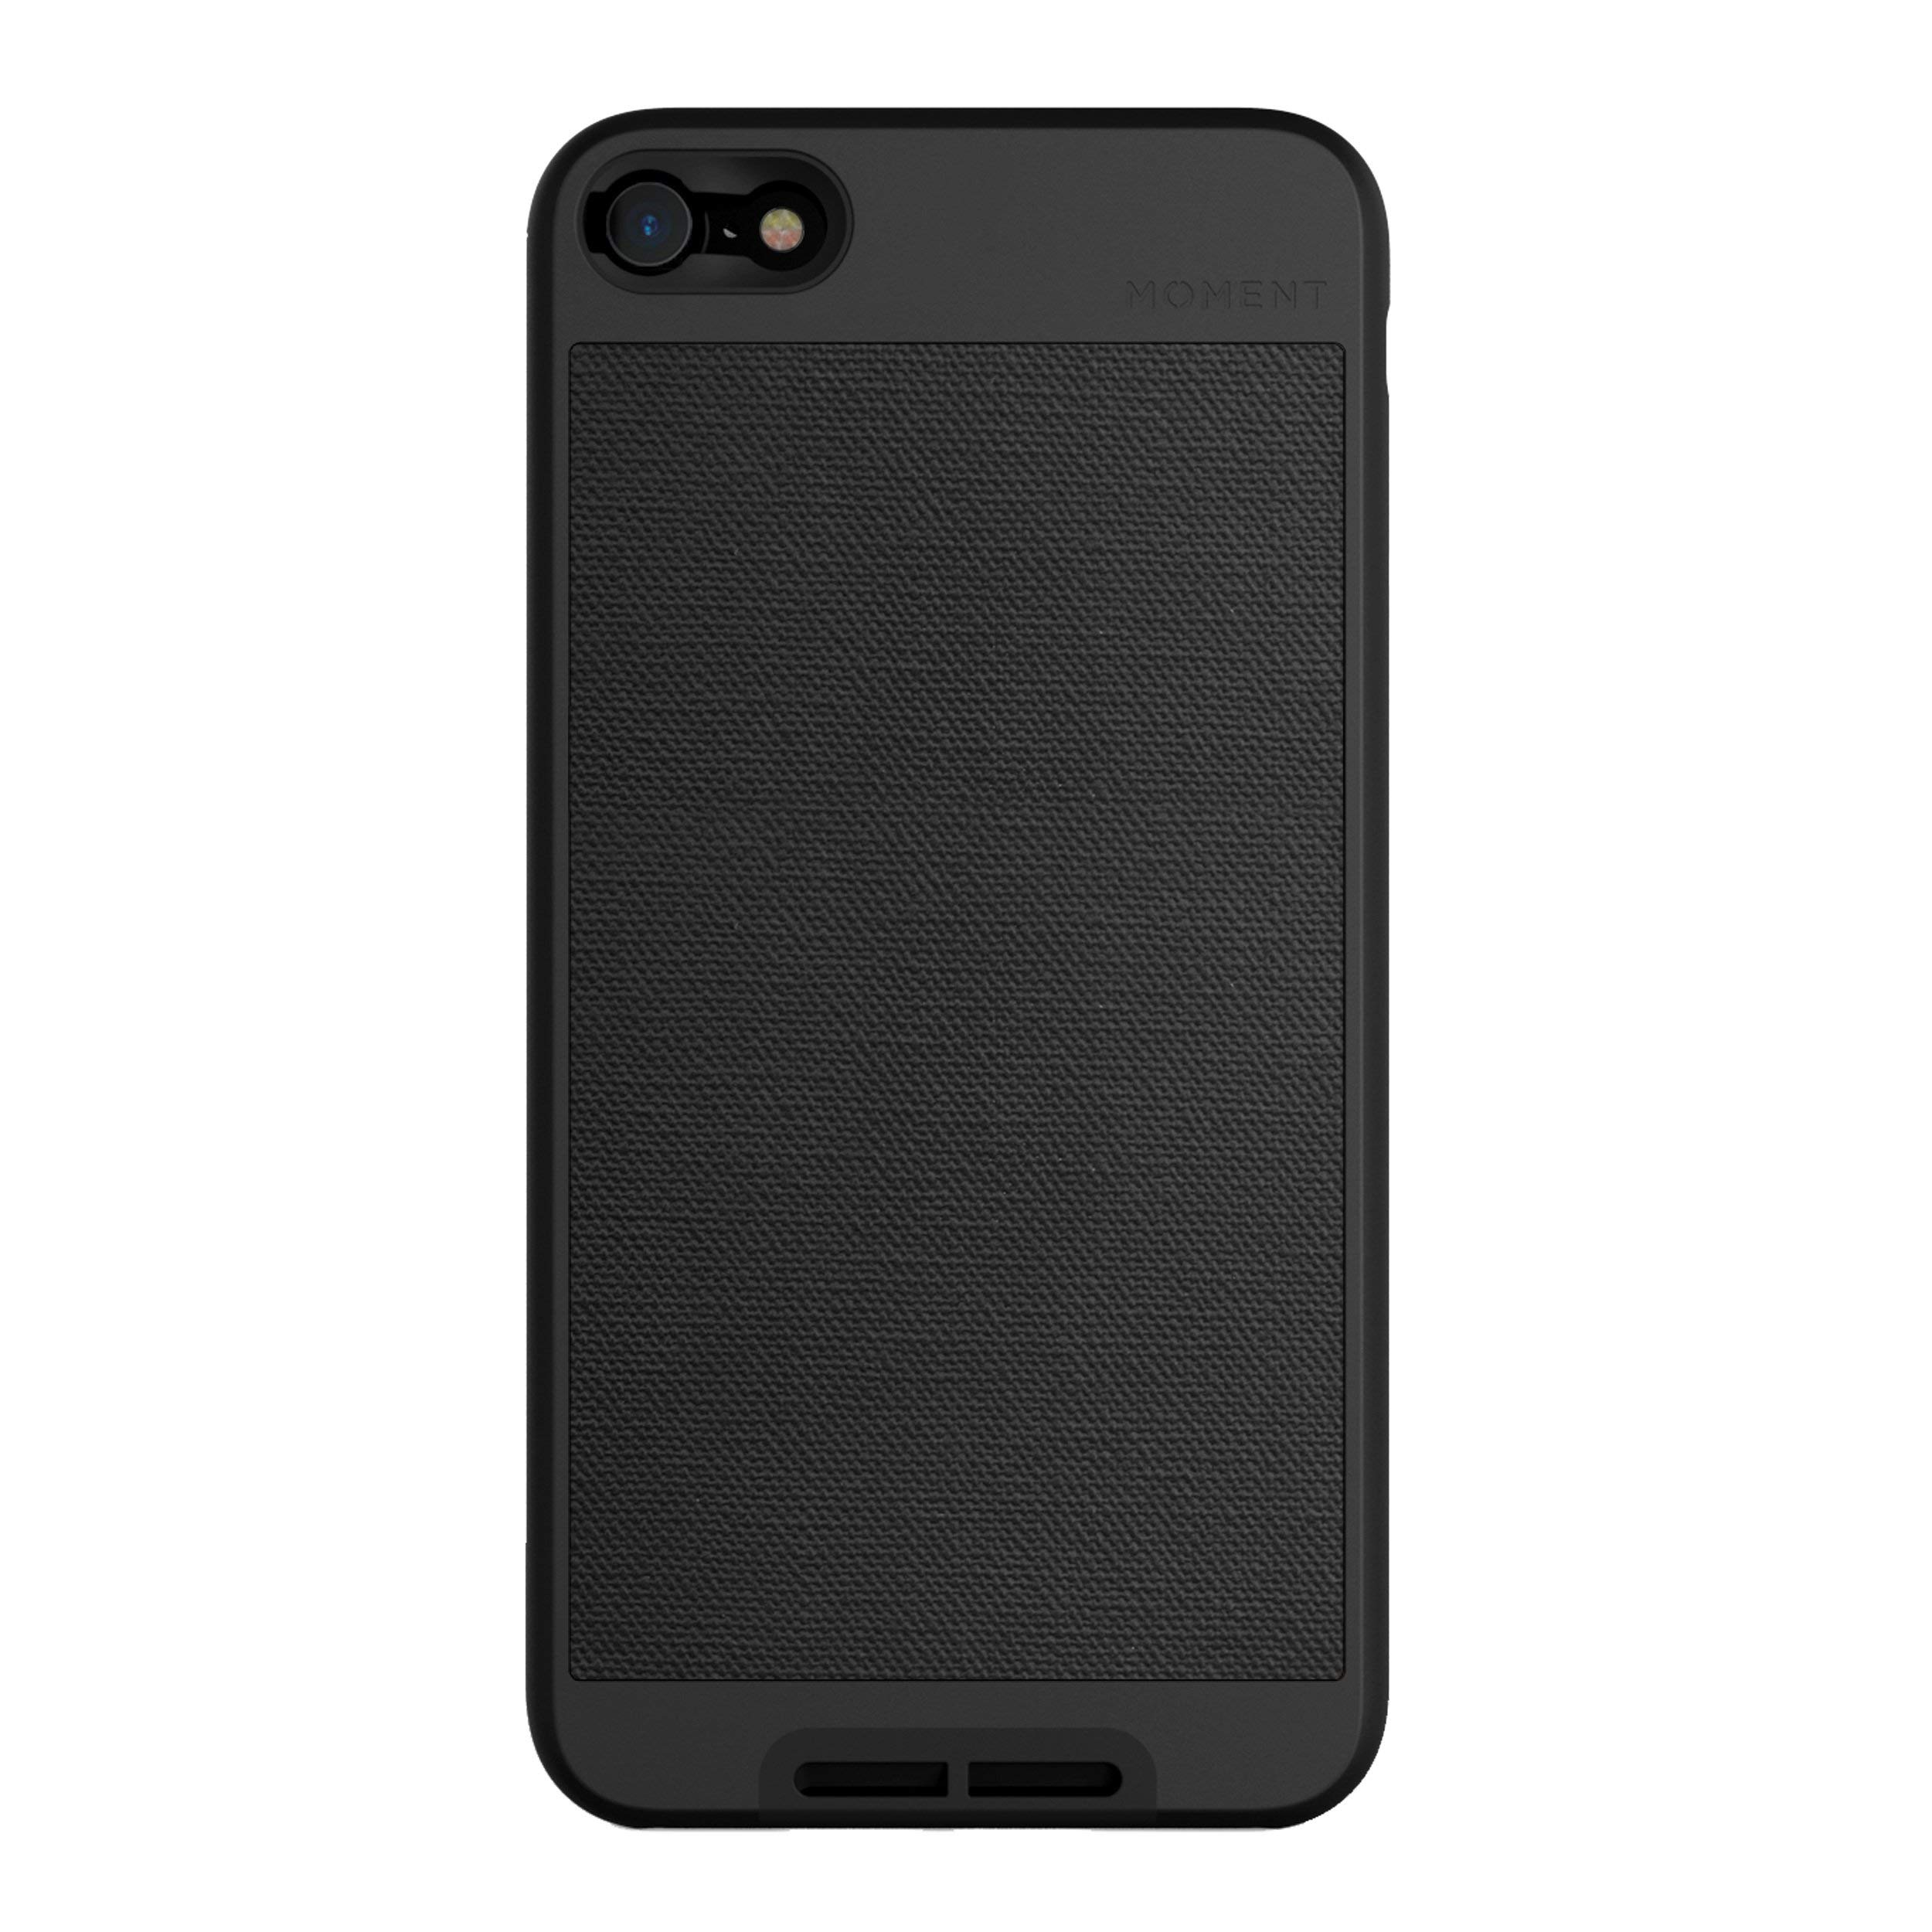 ویکالا · خرید  اصل اورجینال · خرید از آمازون · Moment iPhone 6 Plus / 6s Plus Case Photo Case in Black Canvas - Thin, Protective, Wrist Strap Friendly case for Camera Lovers. wekala · ویکالا